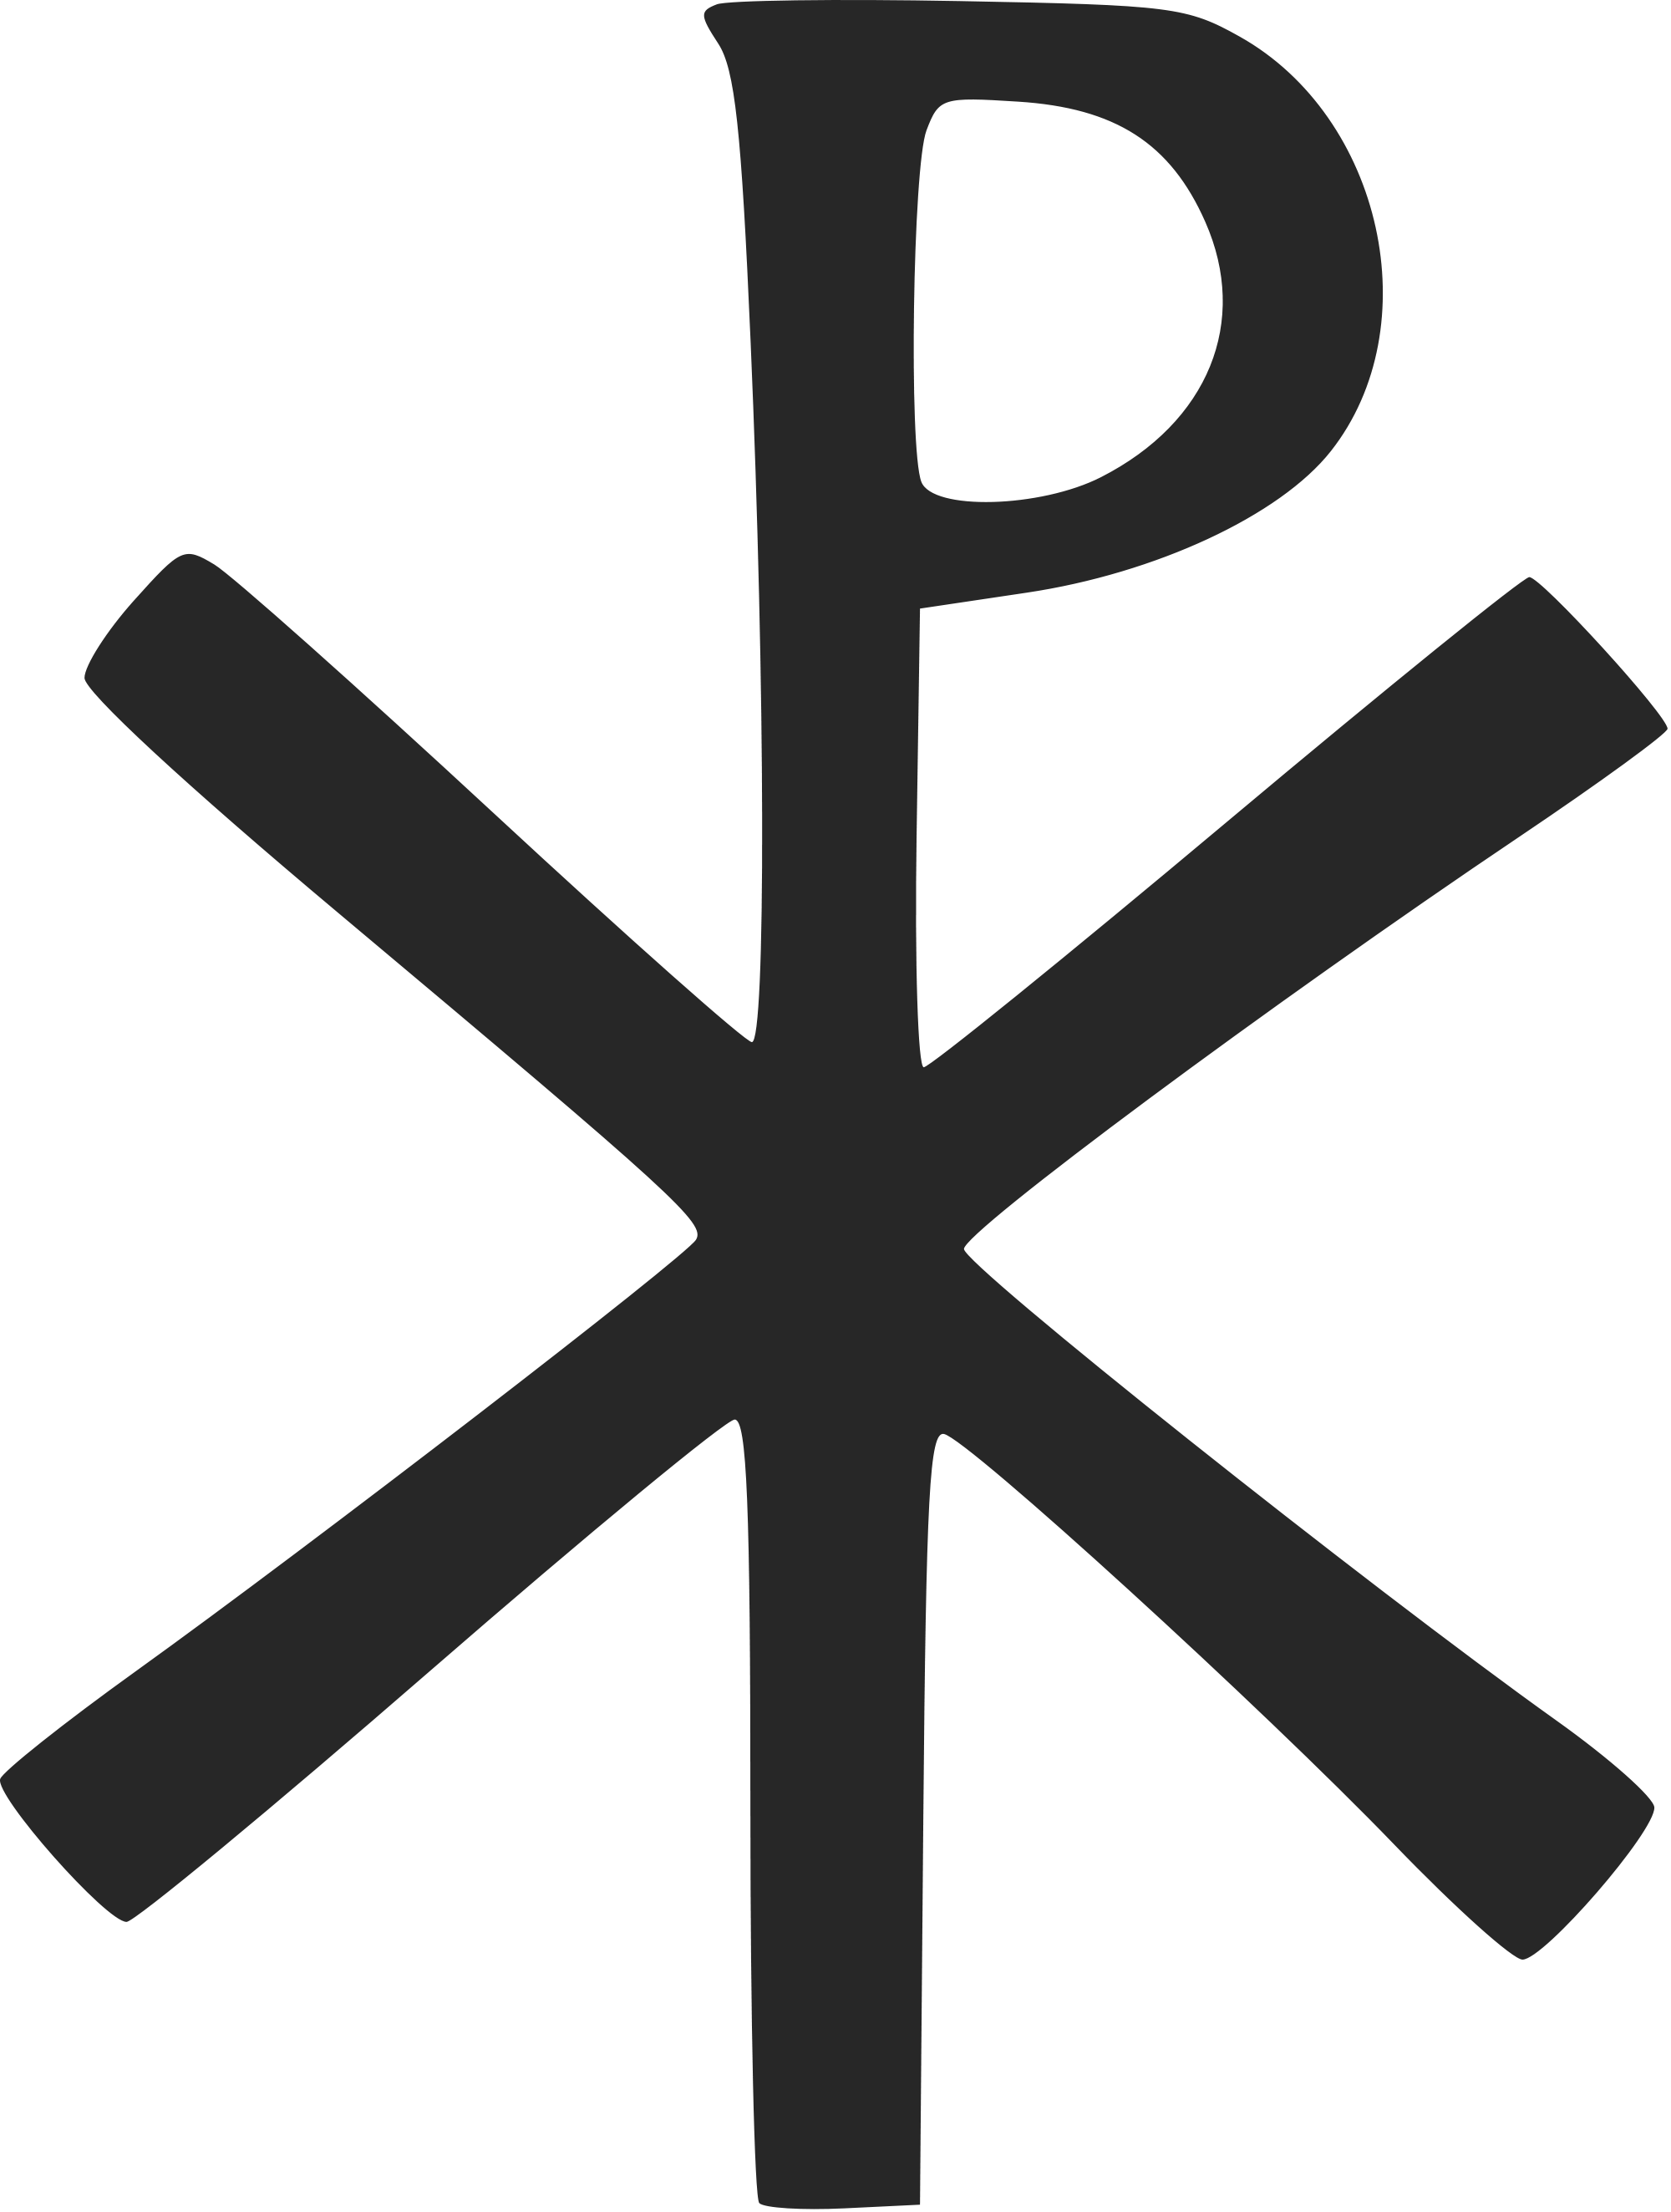 Crucifix clipart shadow. Chi rho wikipedia the